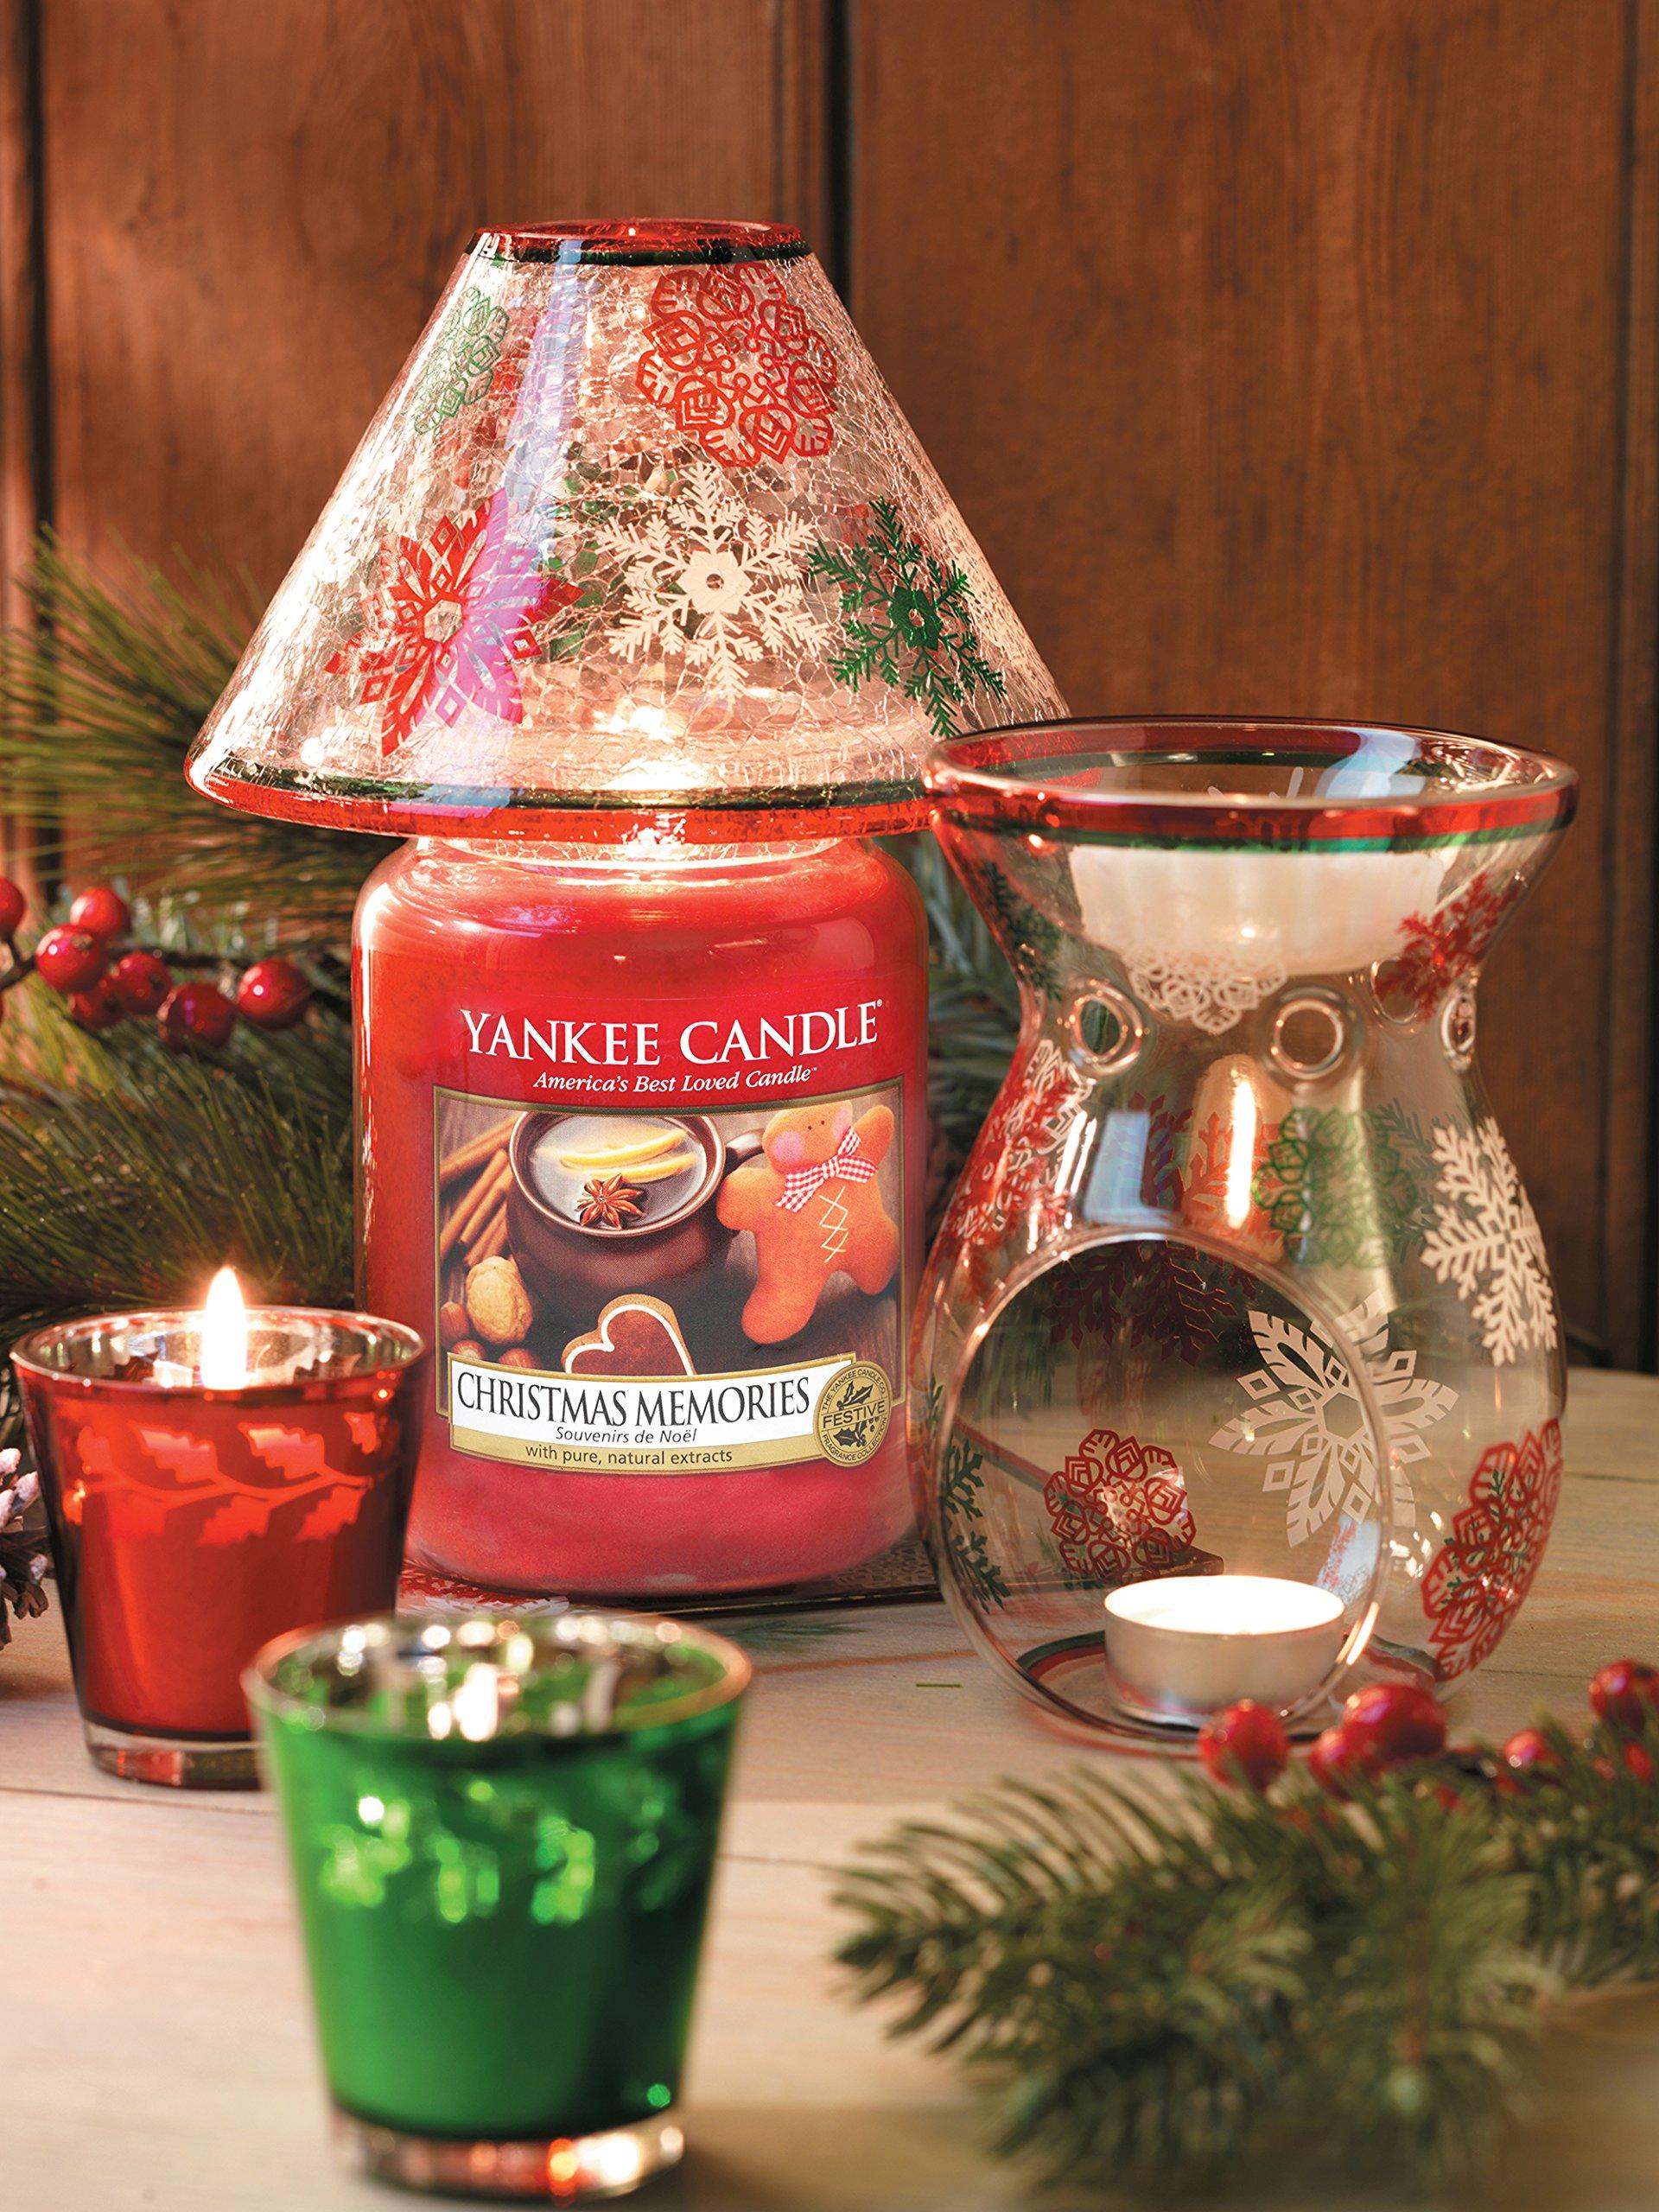 Yankee Candle 1275309E Christmas Memories Candele In Giara Grande, Vetro, Rosso, 10X9.8X17.5 Cm, fragranze naturali 3 spesavip